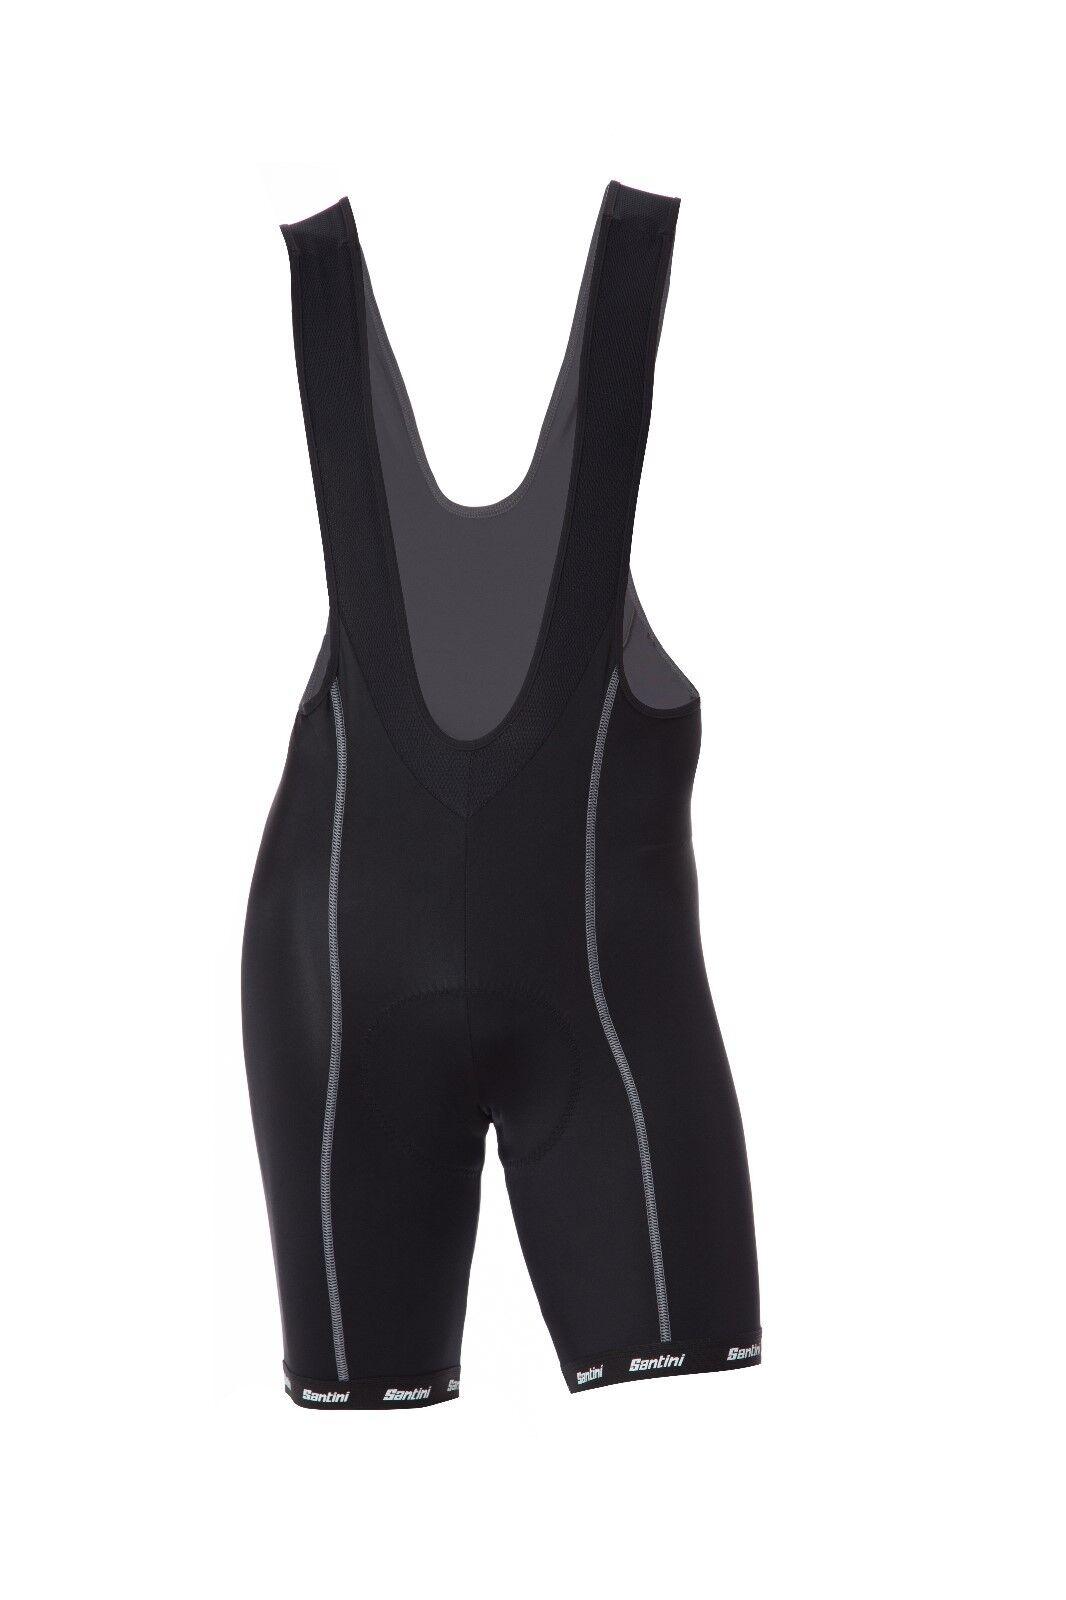 Para  hombres nos Deportivo Ciclismo mono Pantalones cortos (GIT Gamuza) en Negro-Hecho Por Santini  compras en linea